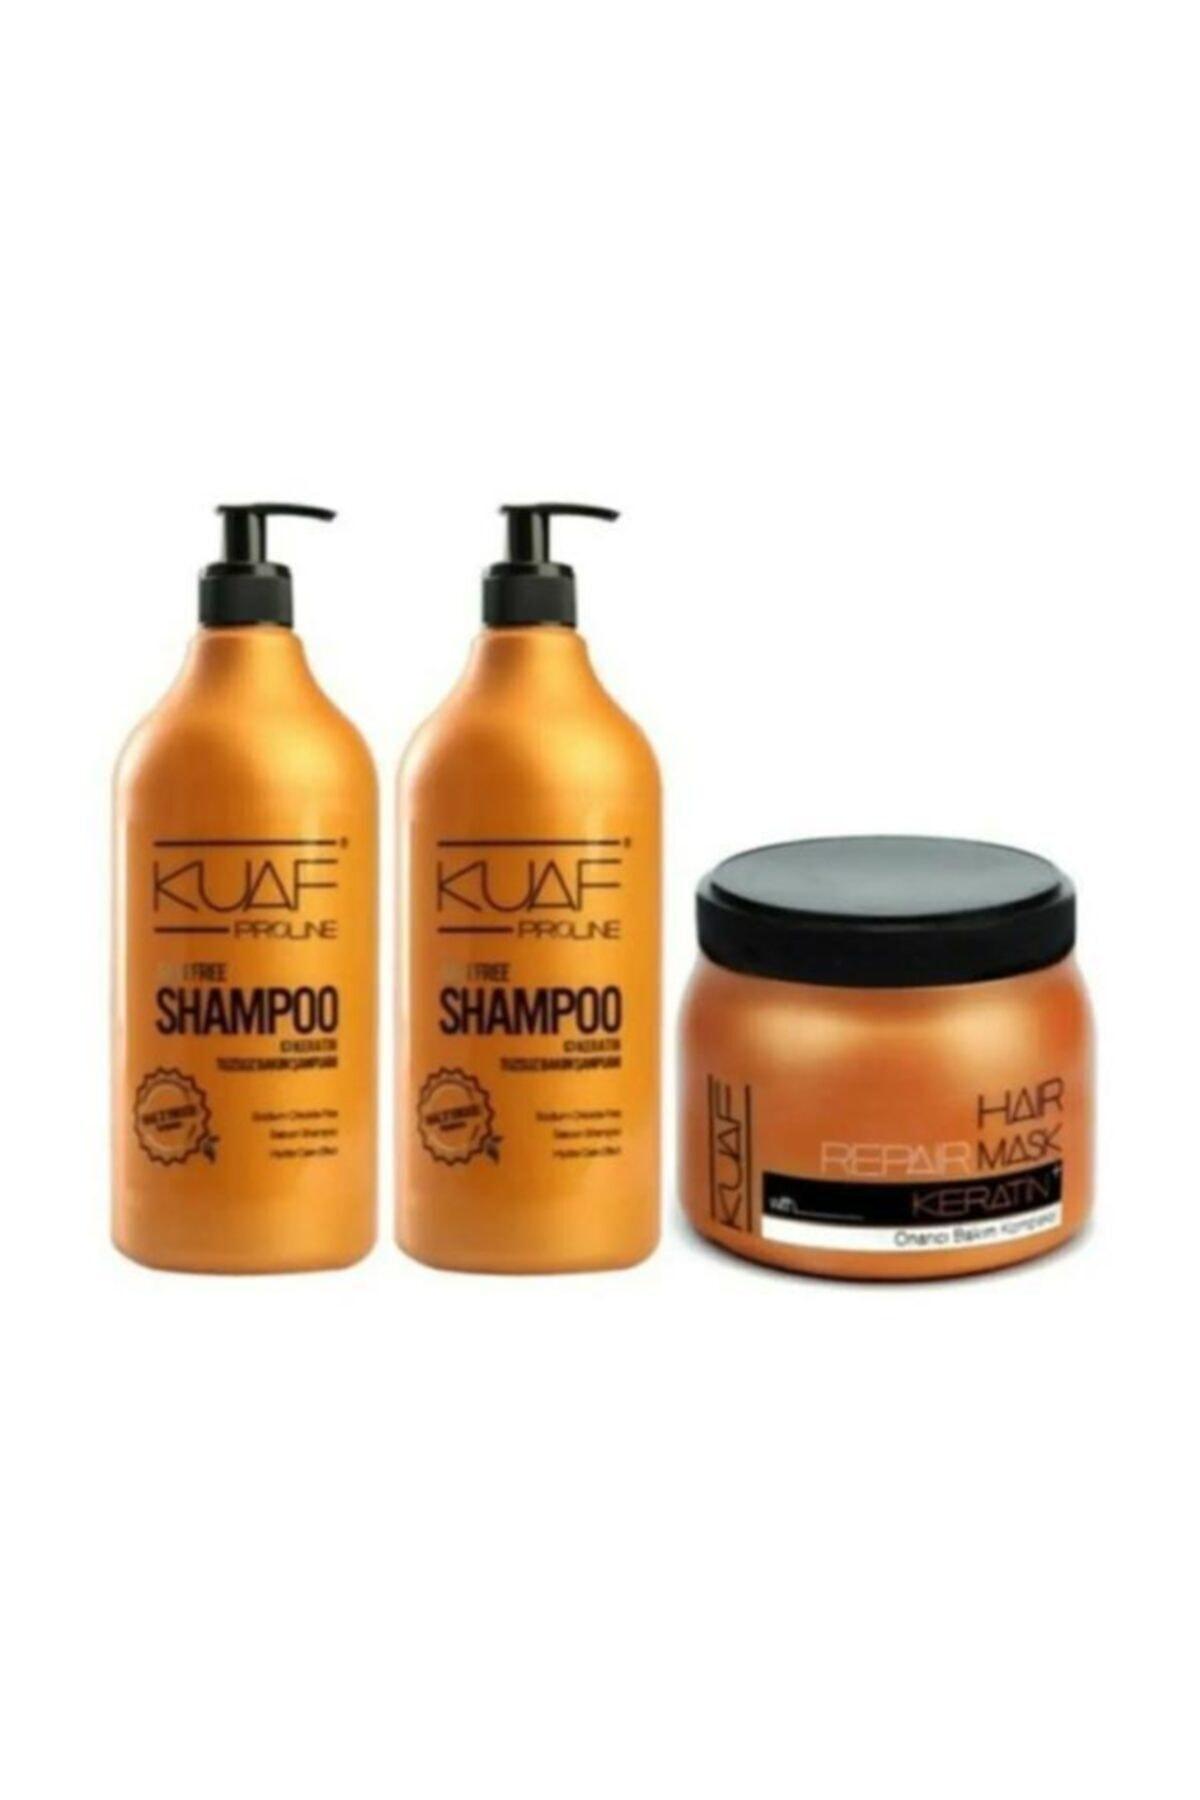 Tuz Içermeyen Tuzsuz Şampuan 1000 ml X 2 Adet + Keratin Maskesi 500 ml